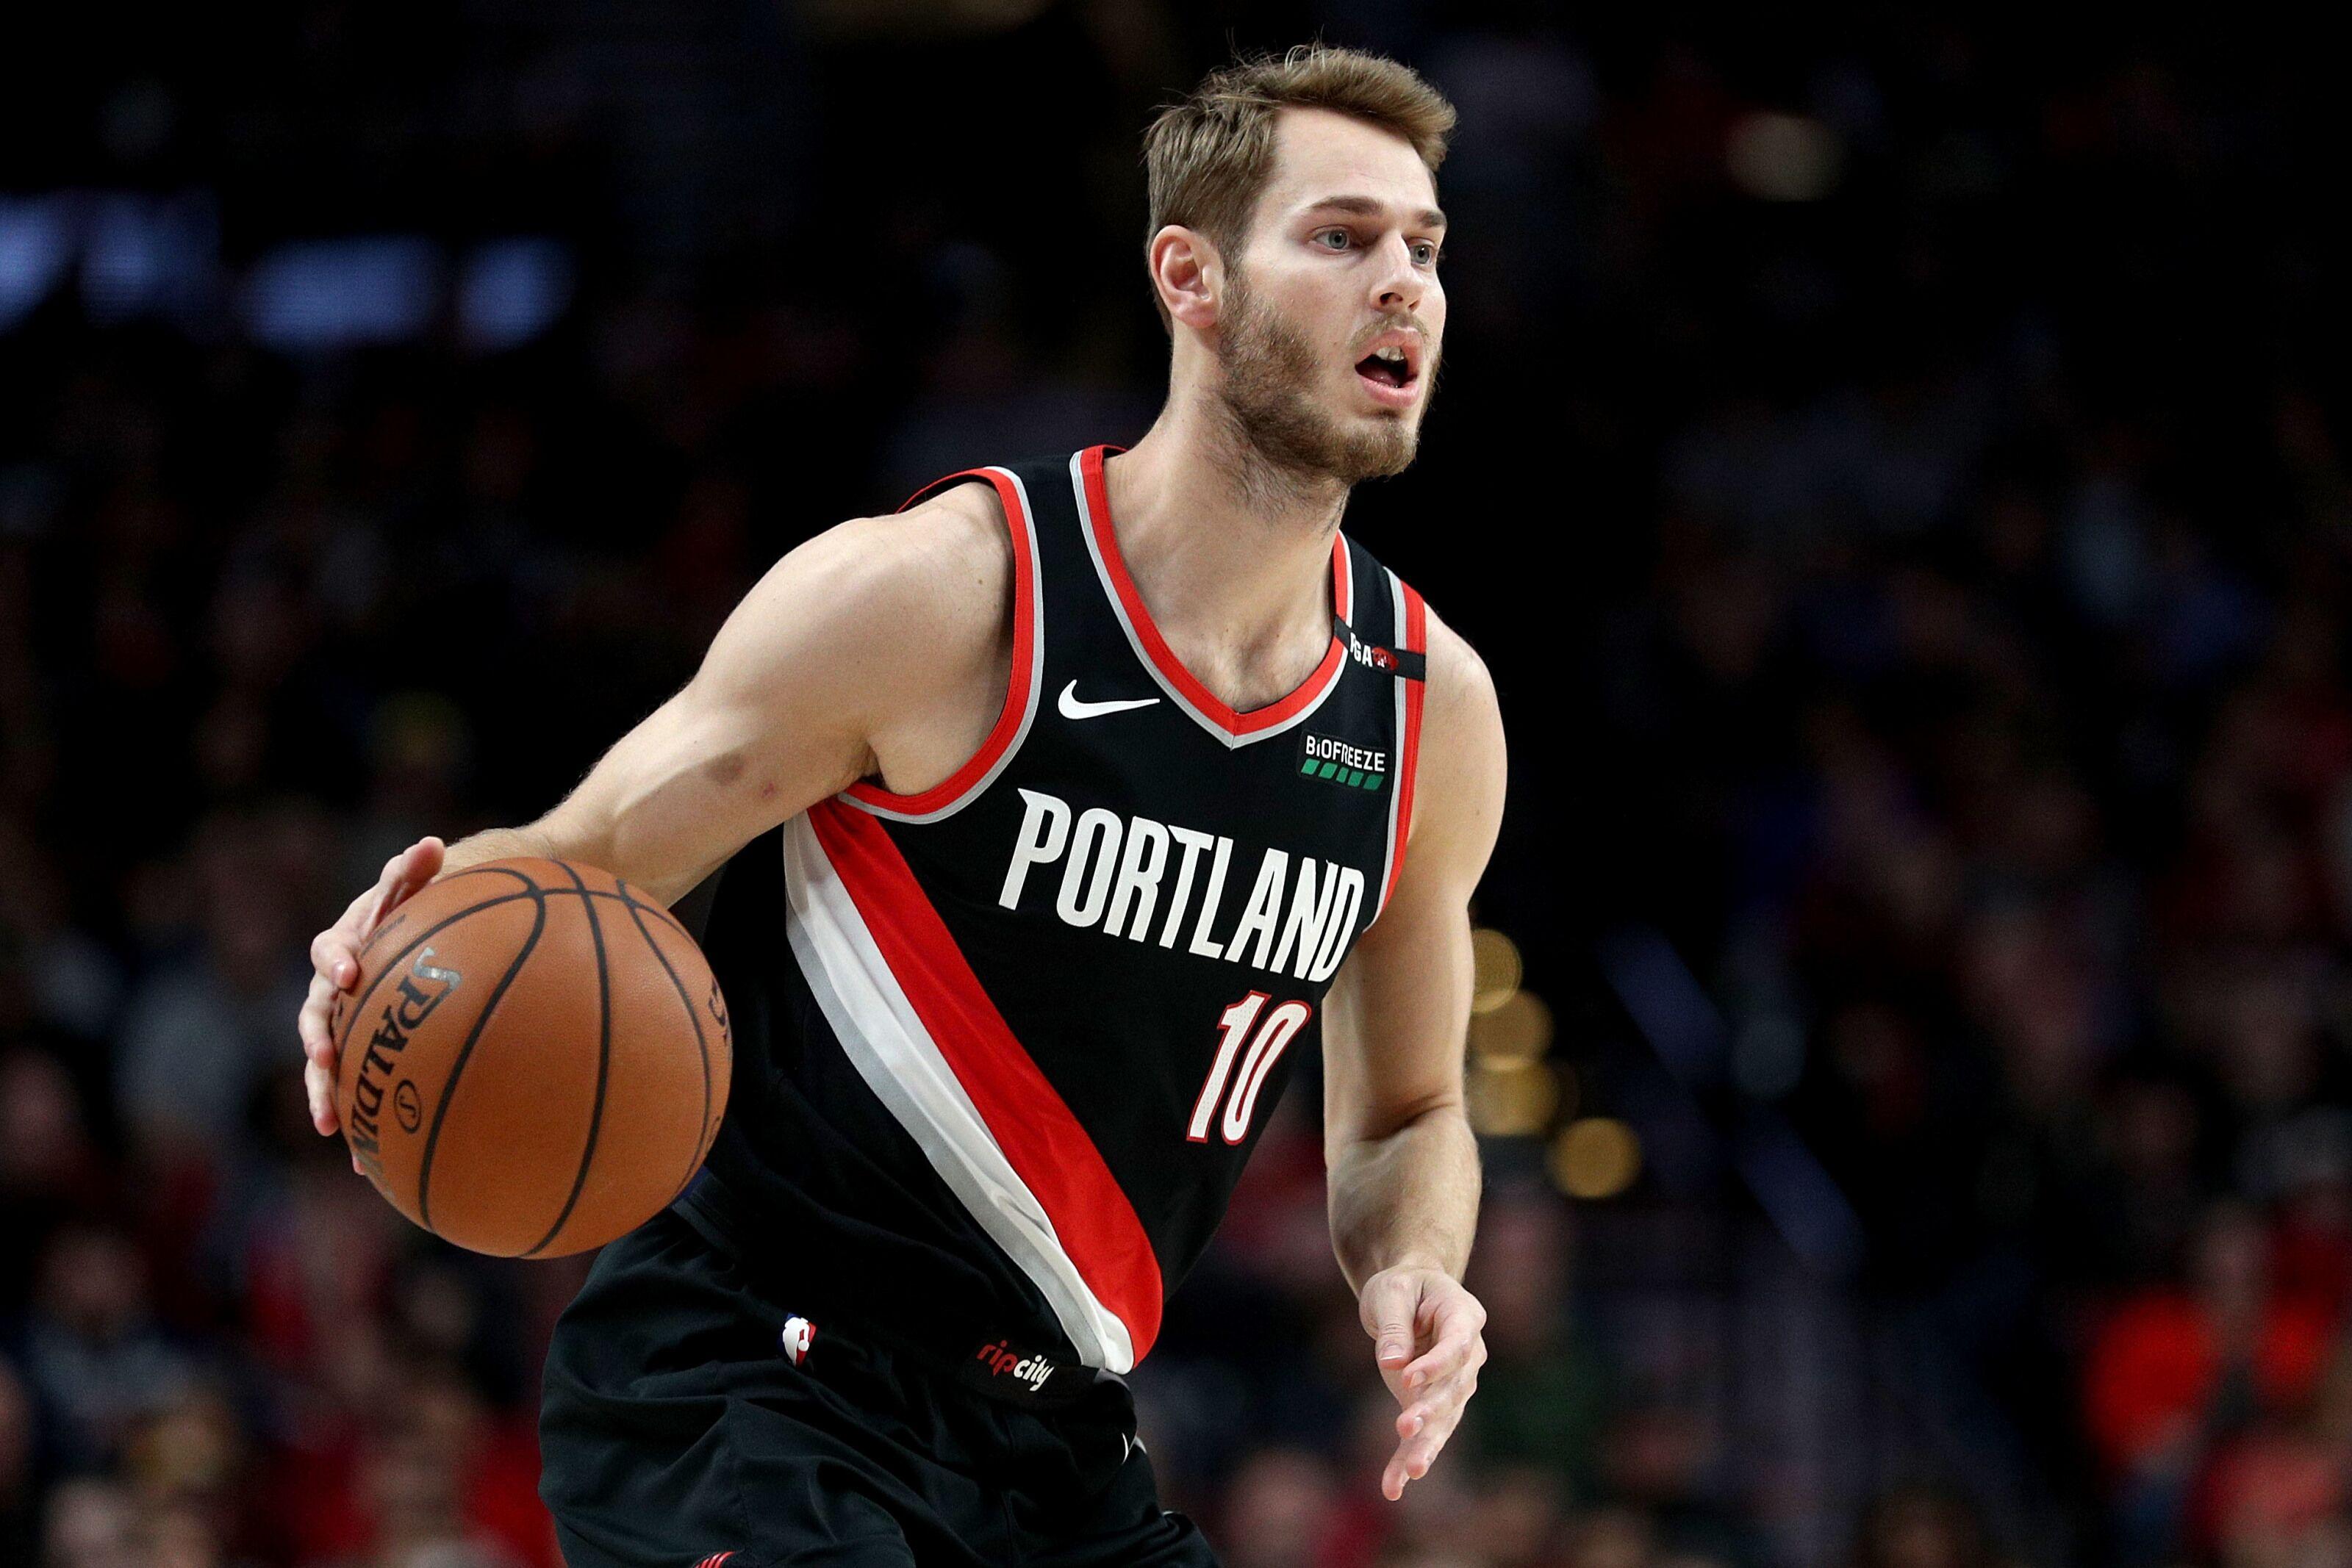 Portland Trail Blazers: Jake Layman's Struggles Continue